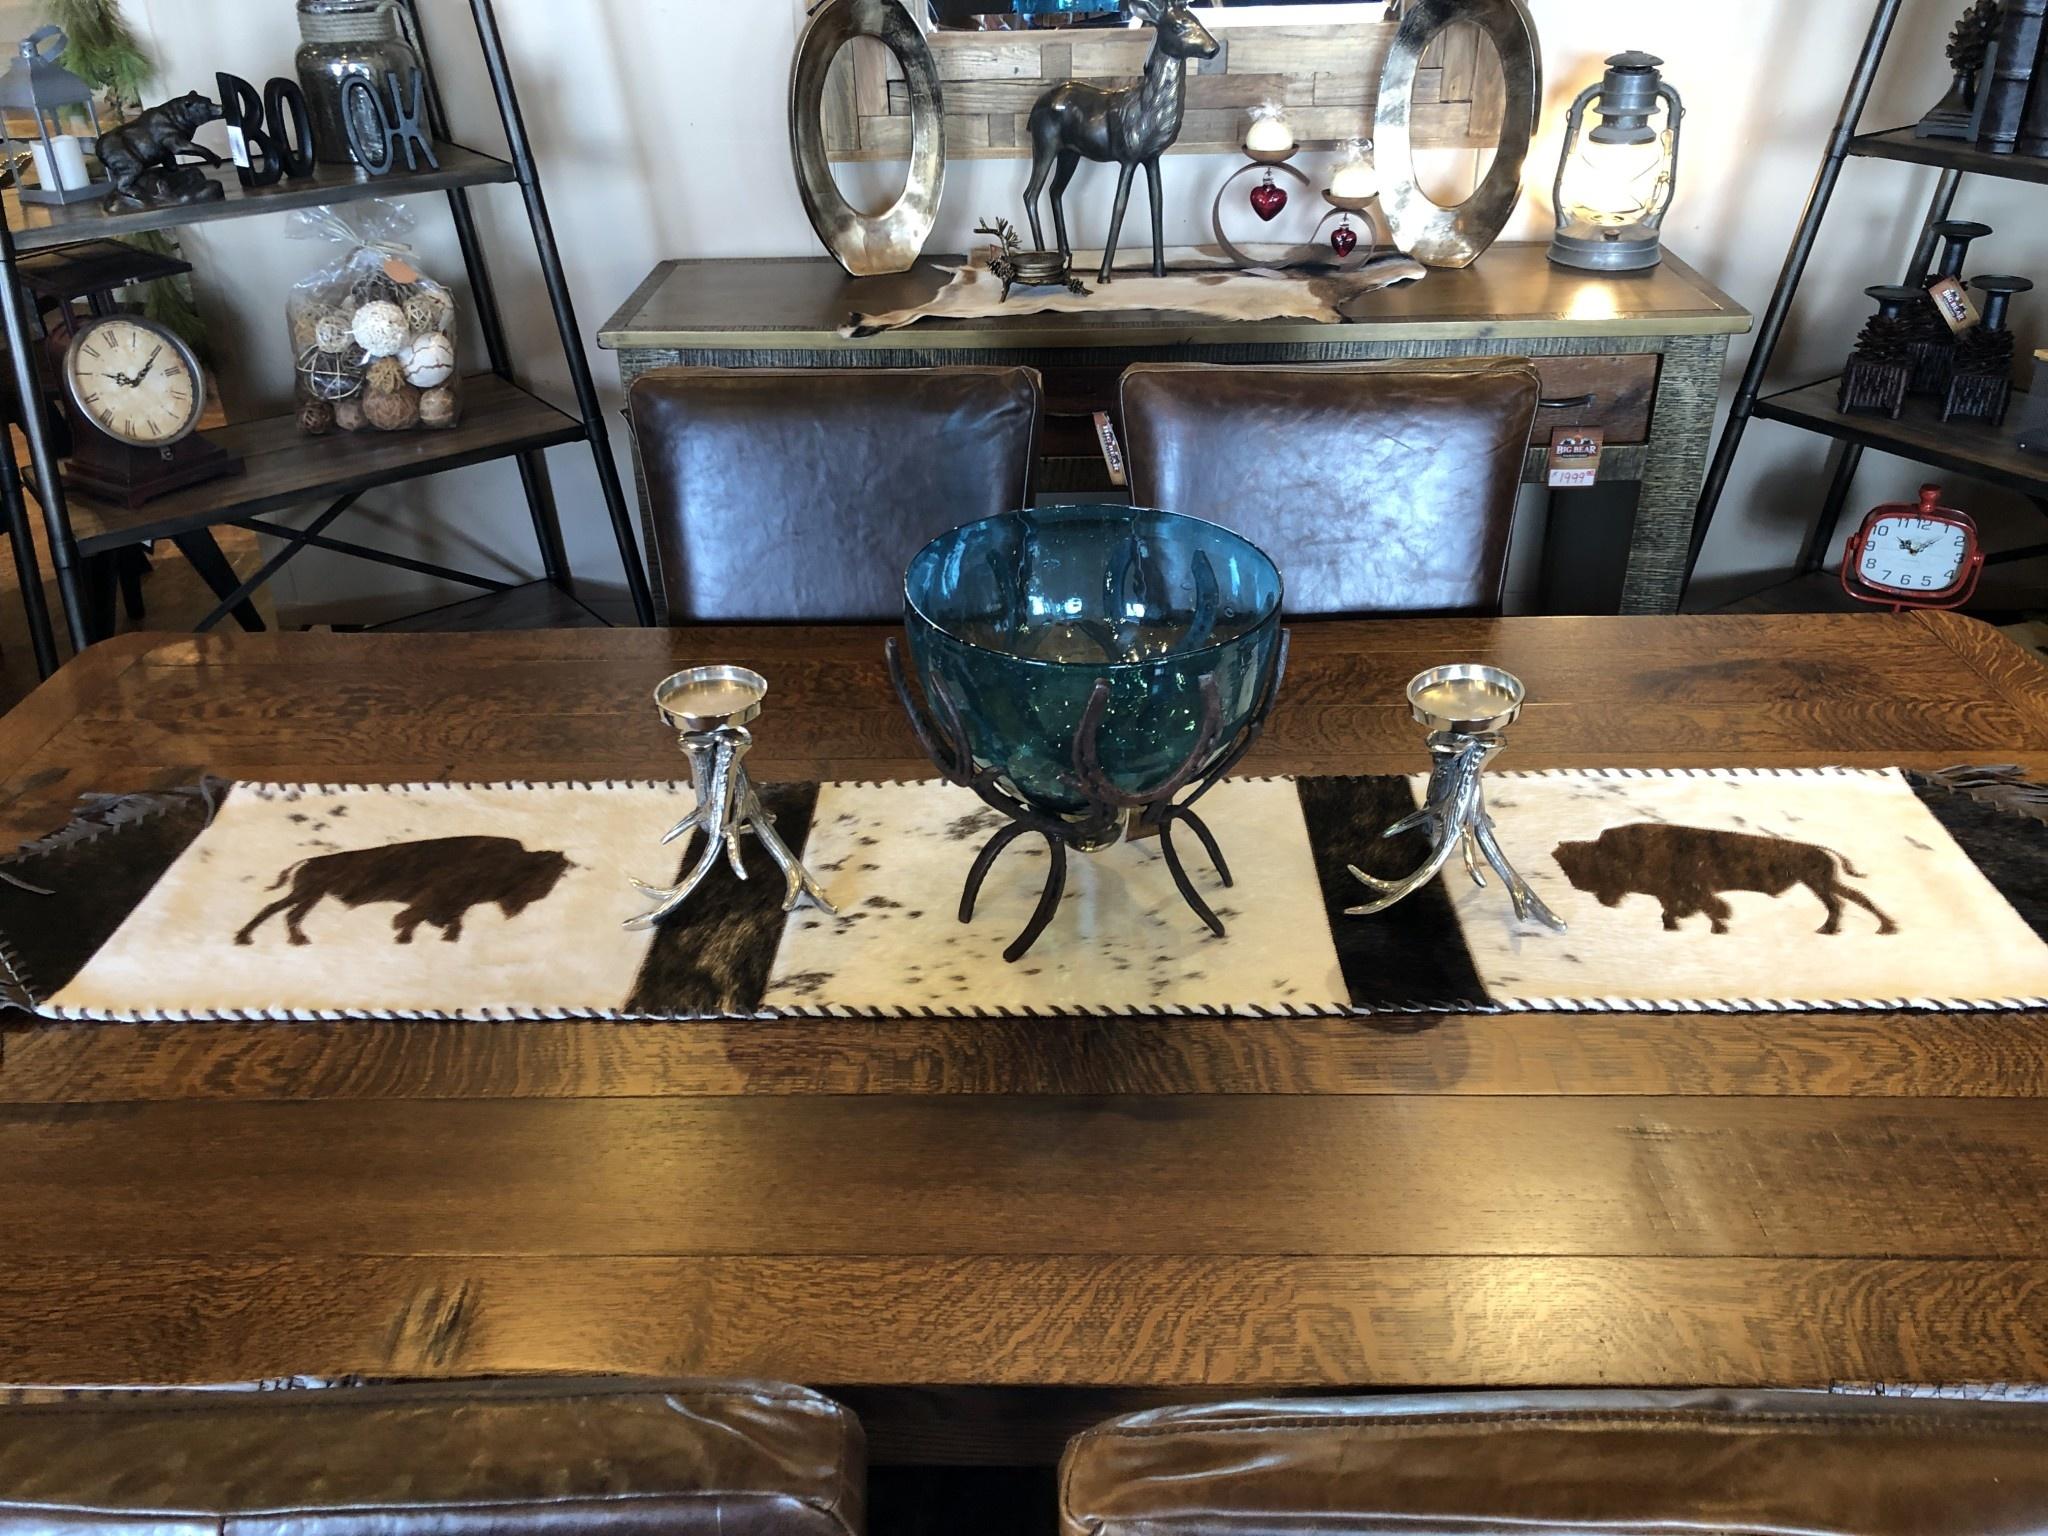 Gaucho Large Buffalo Cowhide Table Runner